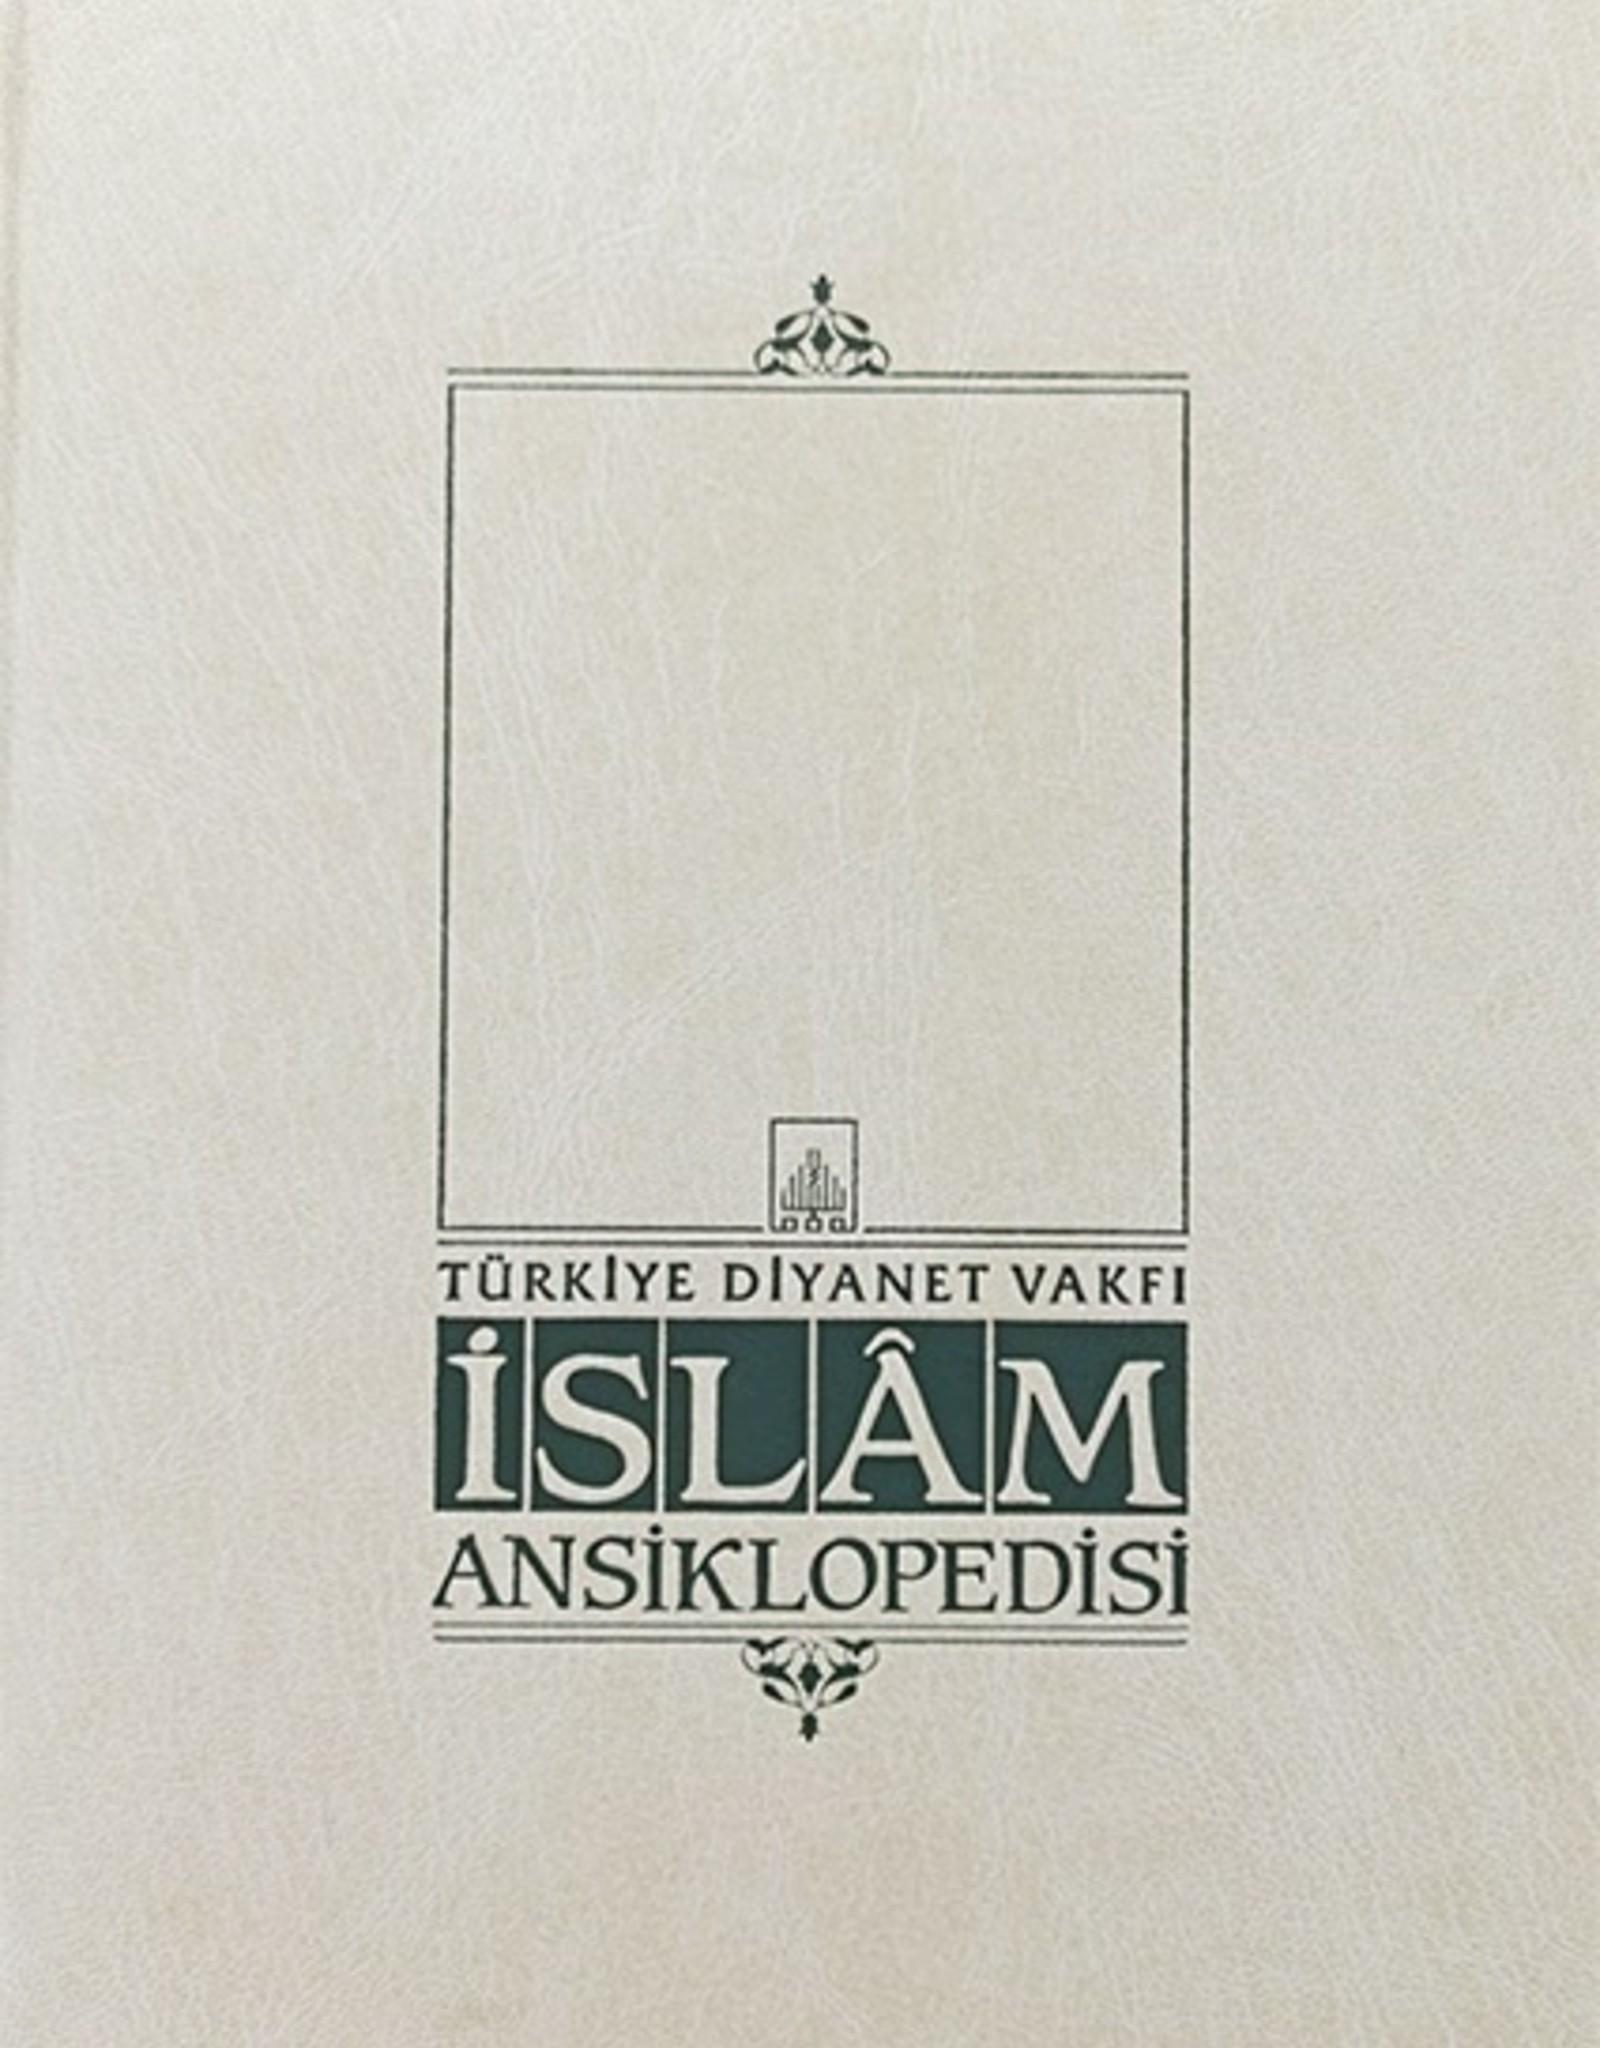 İslam Ansiklopedisi 26. Cilt